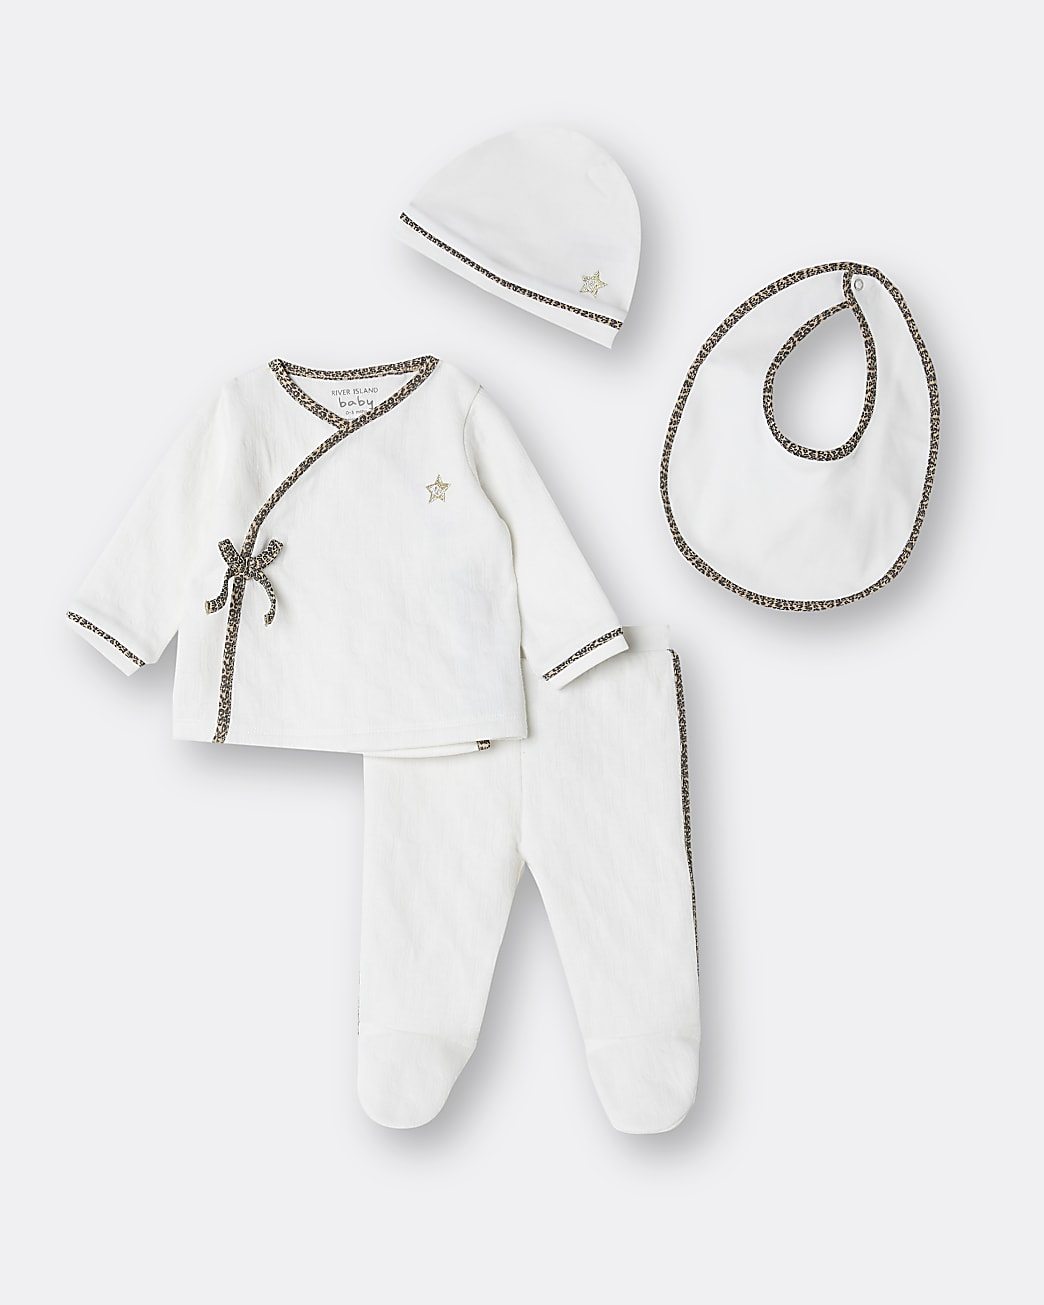 Baby cream kimono 4 piece outfit